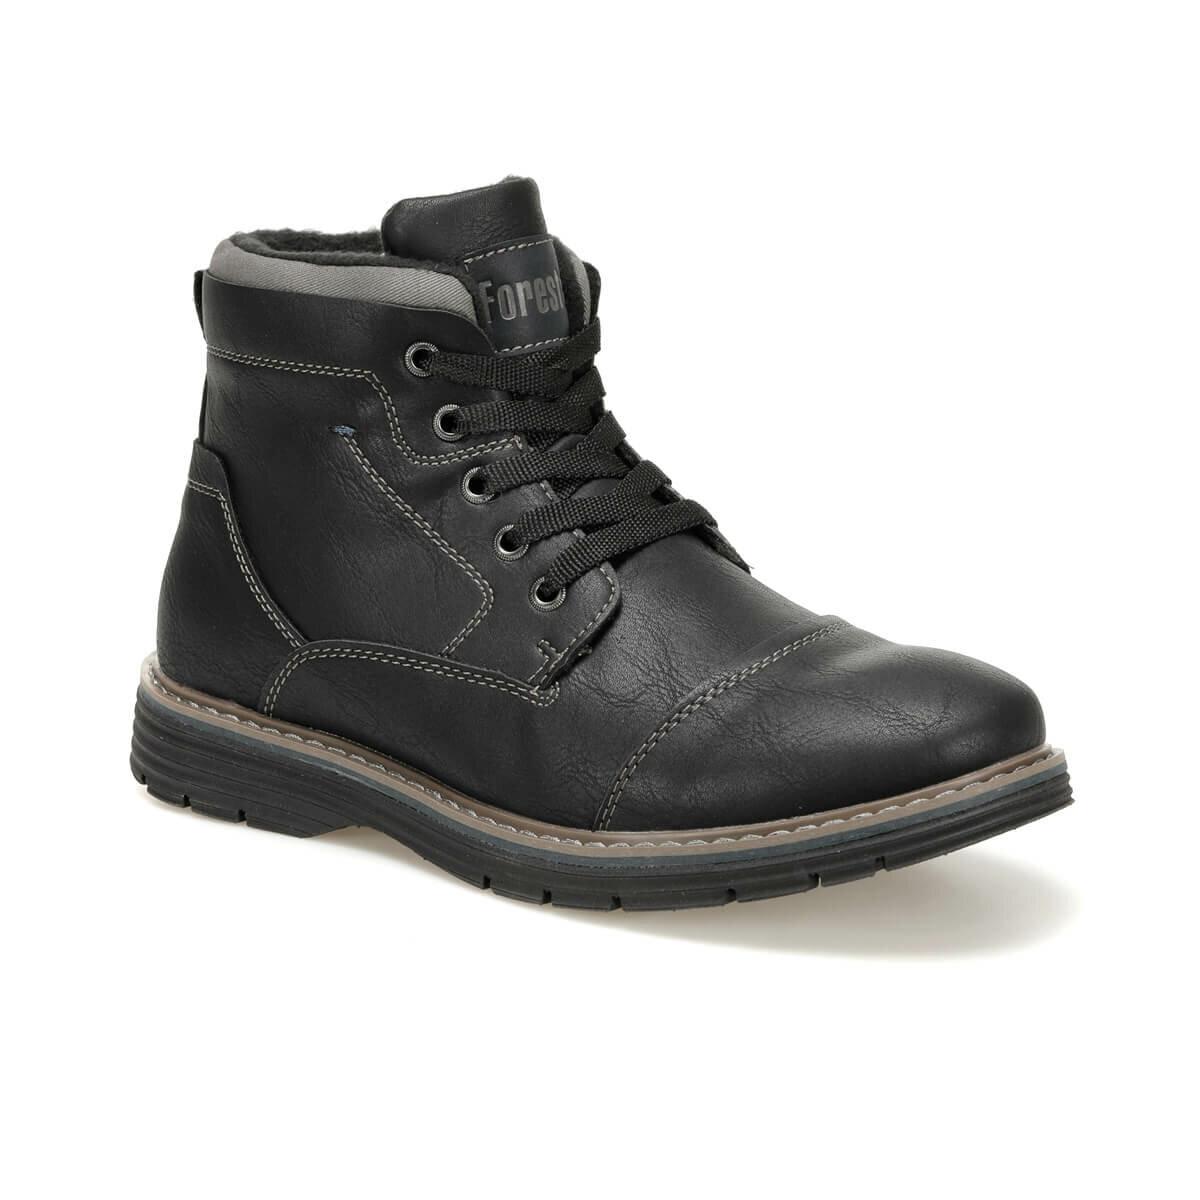 FLO SD9899-4 Black Men Boots Forester